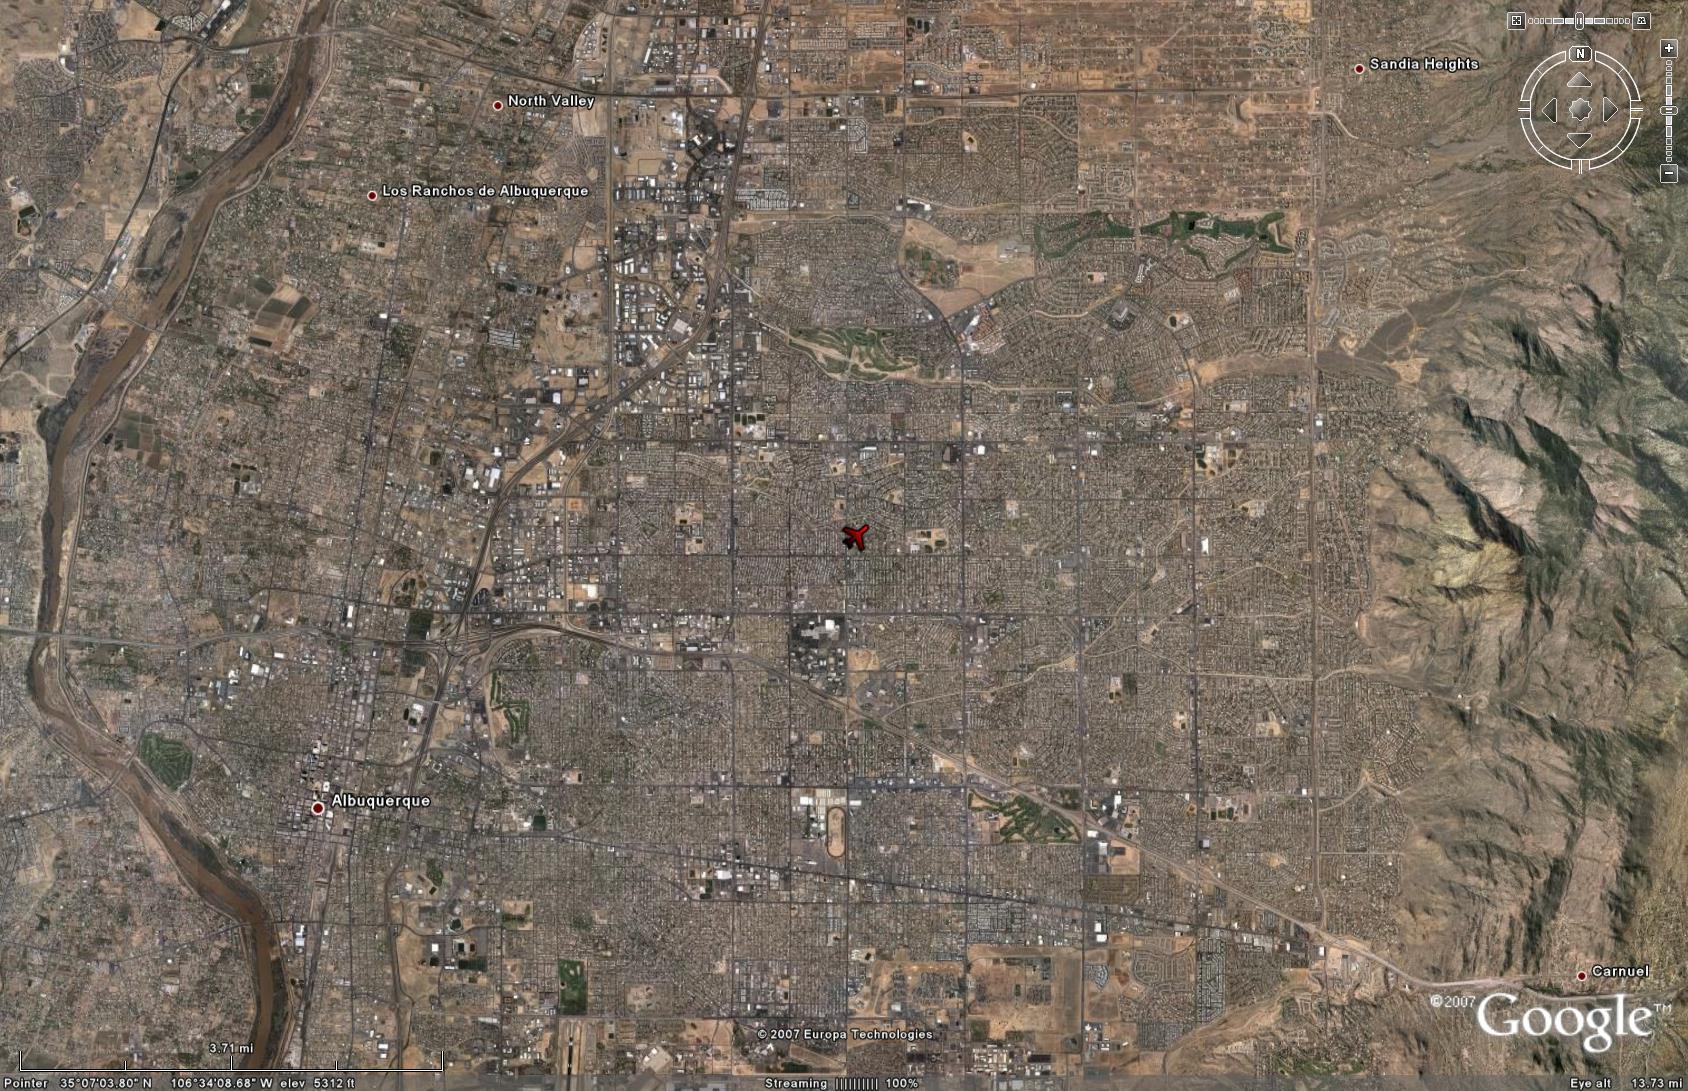 Google Maps Albuquerque on